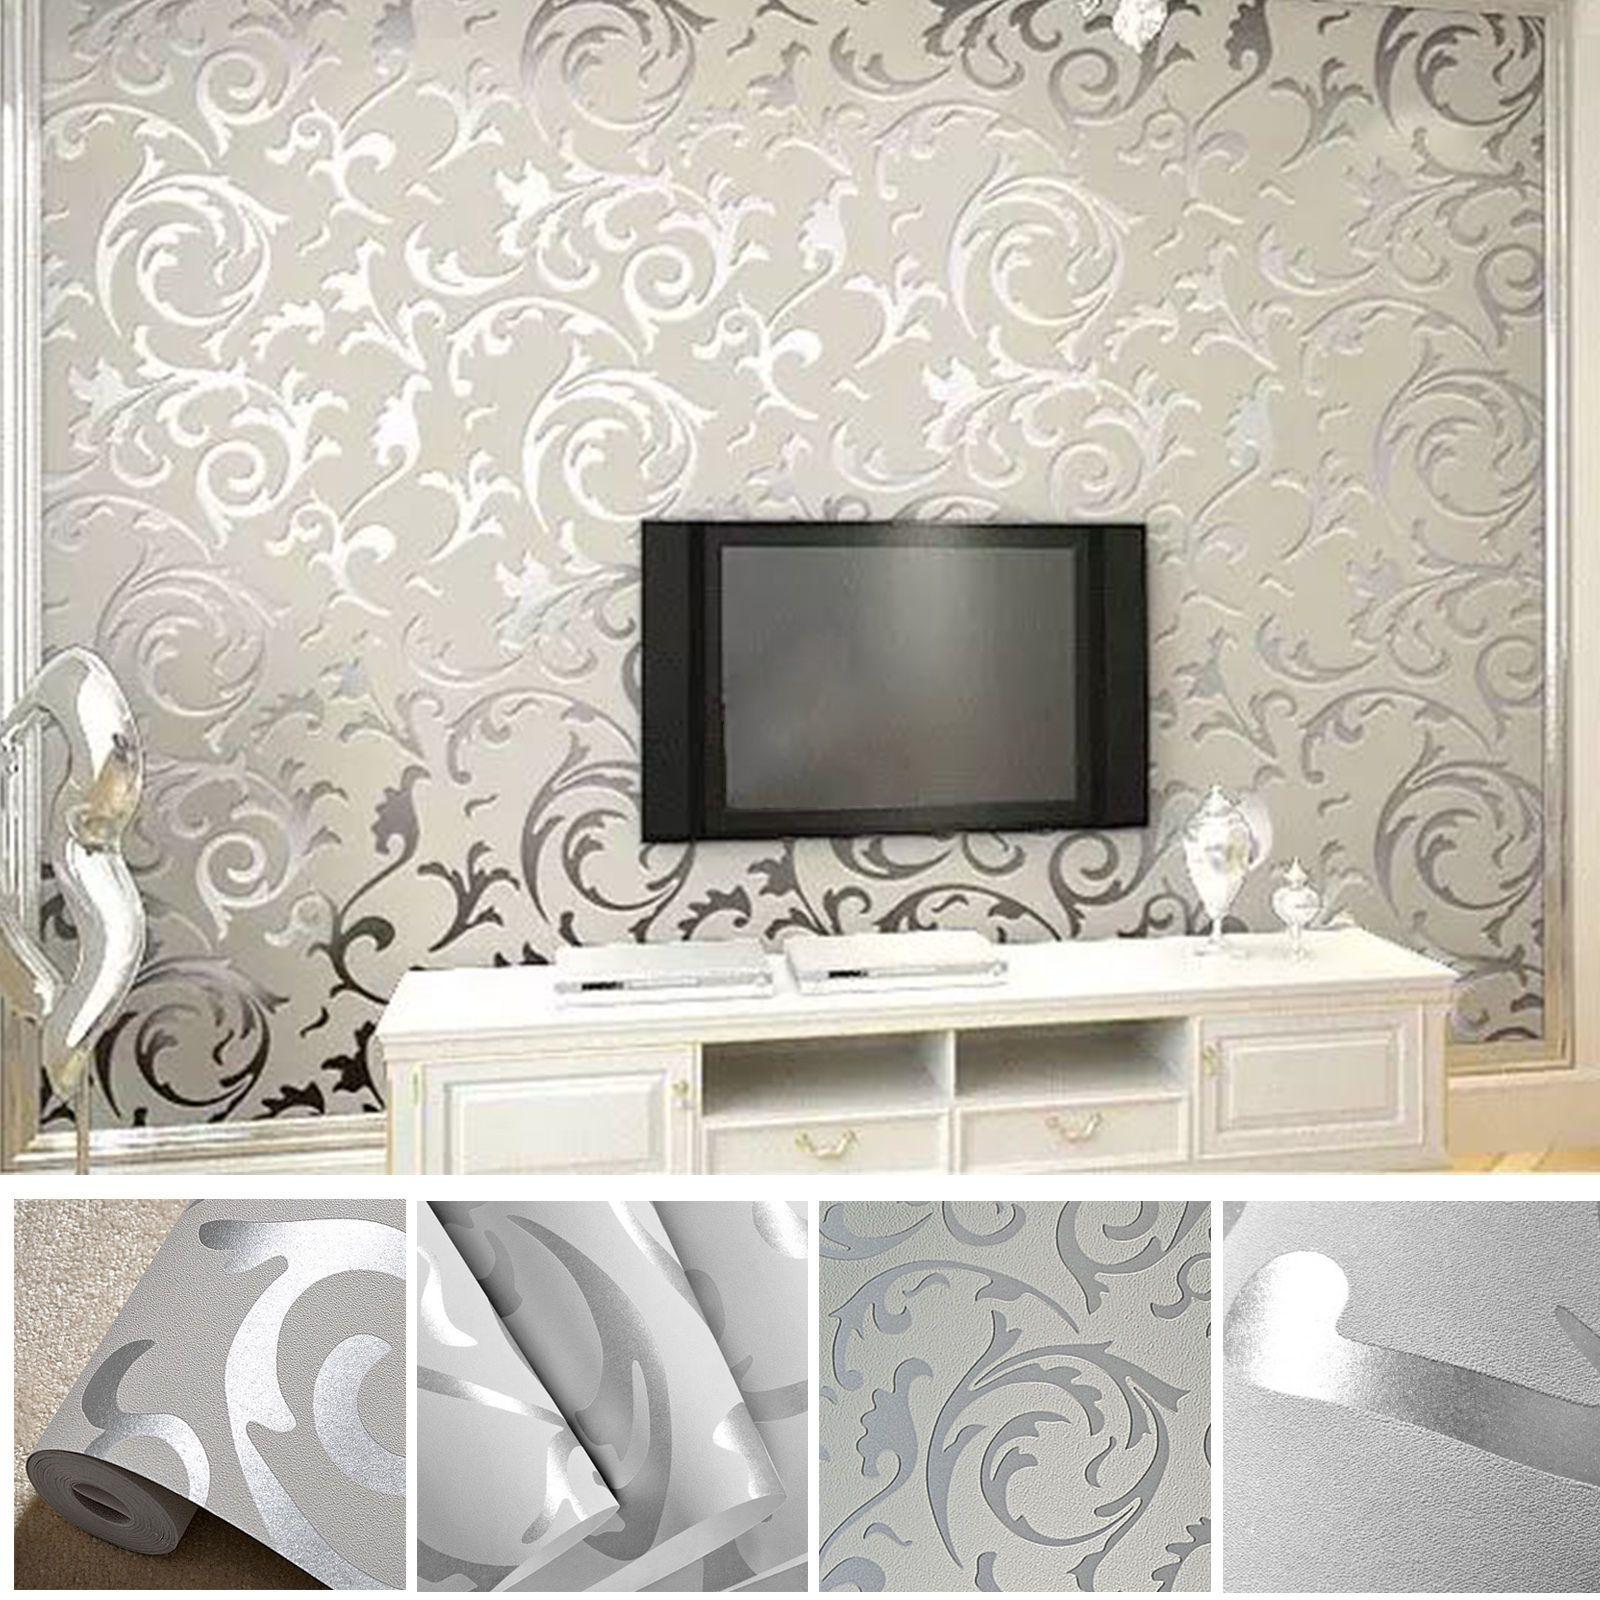 Vliestapete 3D Optik Vlies Wand Tapete Barock Rolle Wandtapete Dekoration  Silber